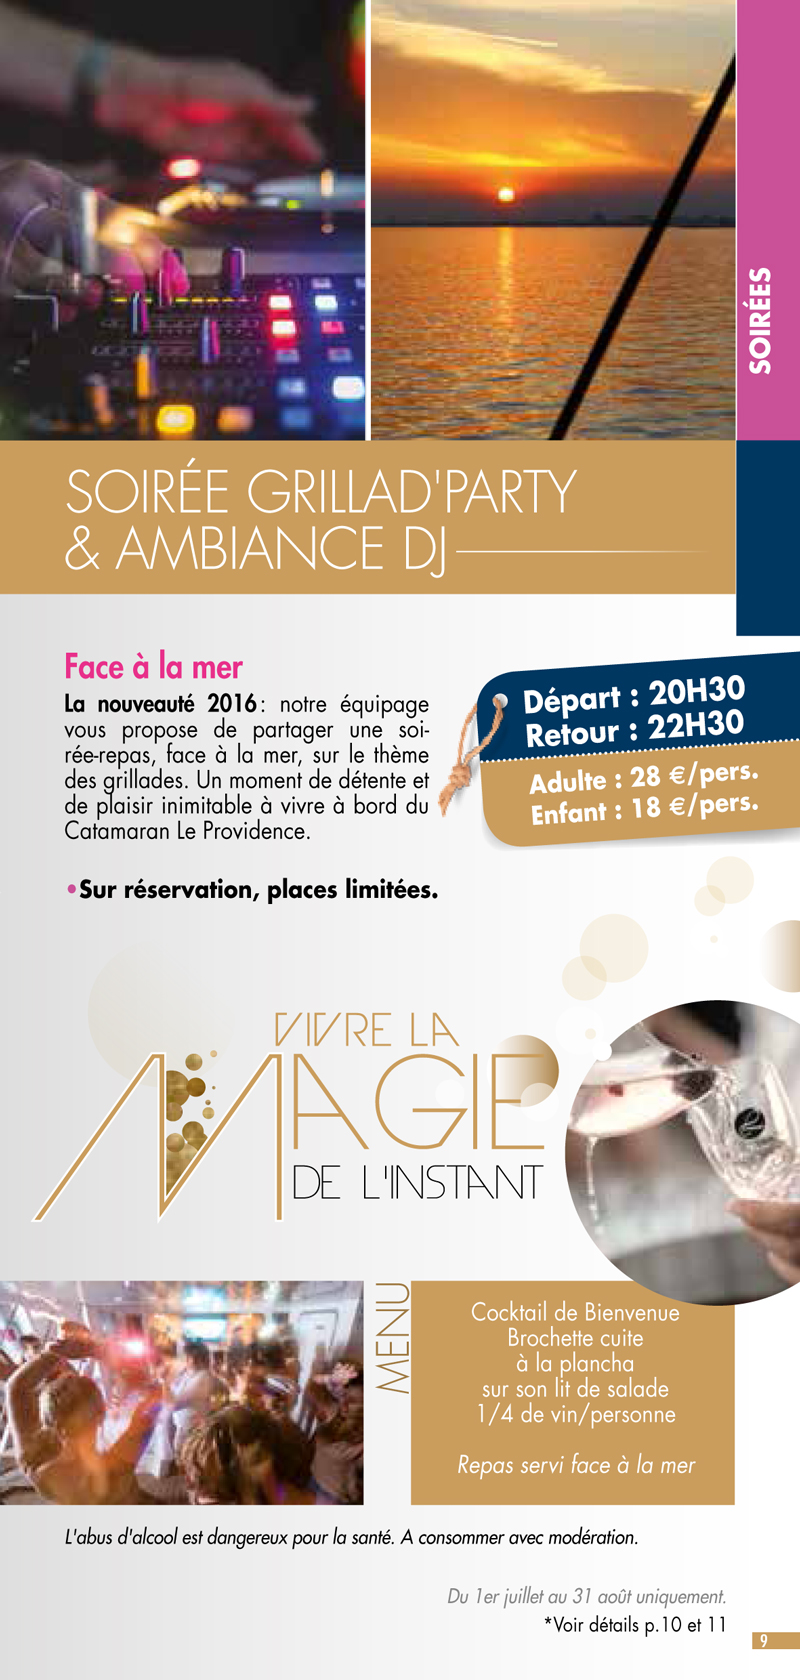 Soirée Grillad'Party